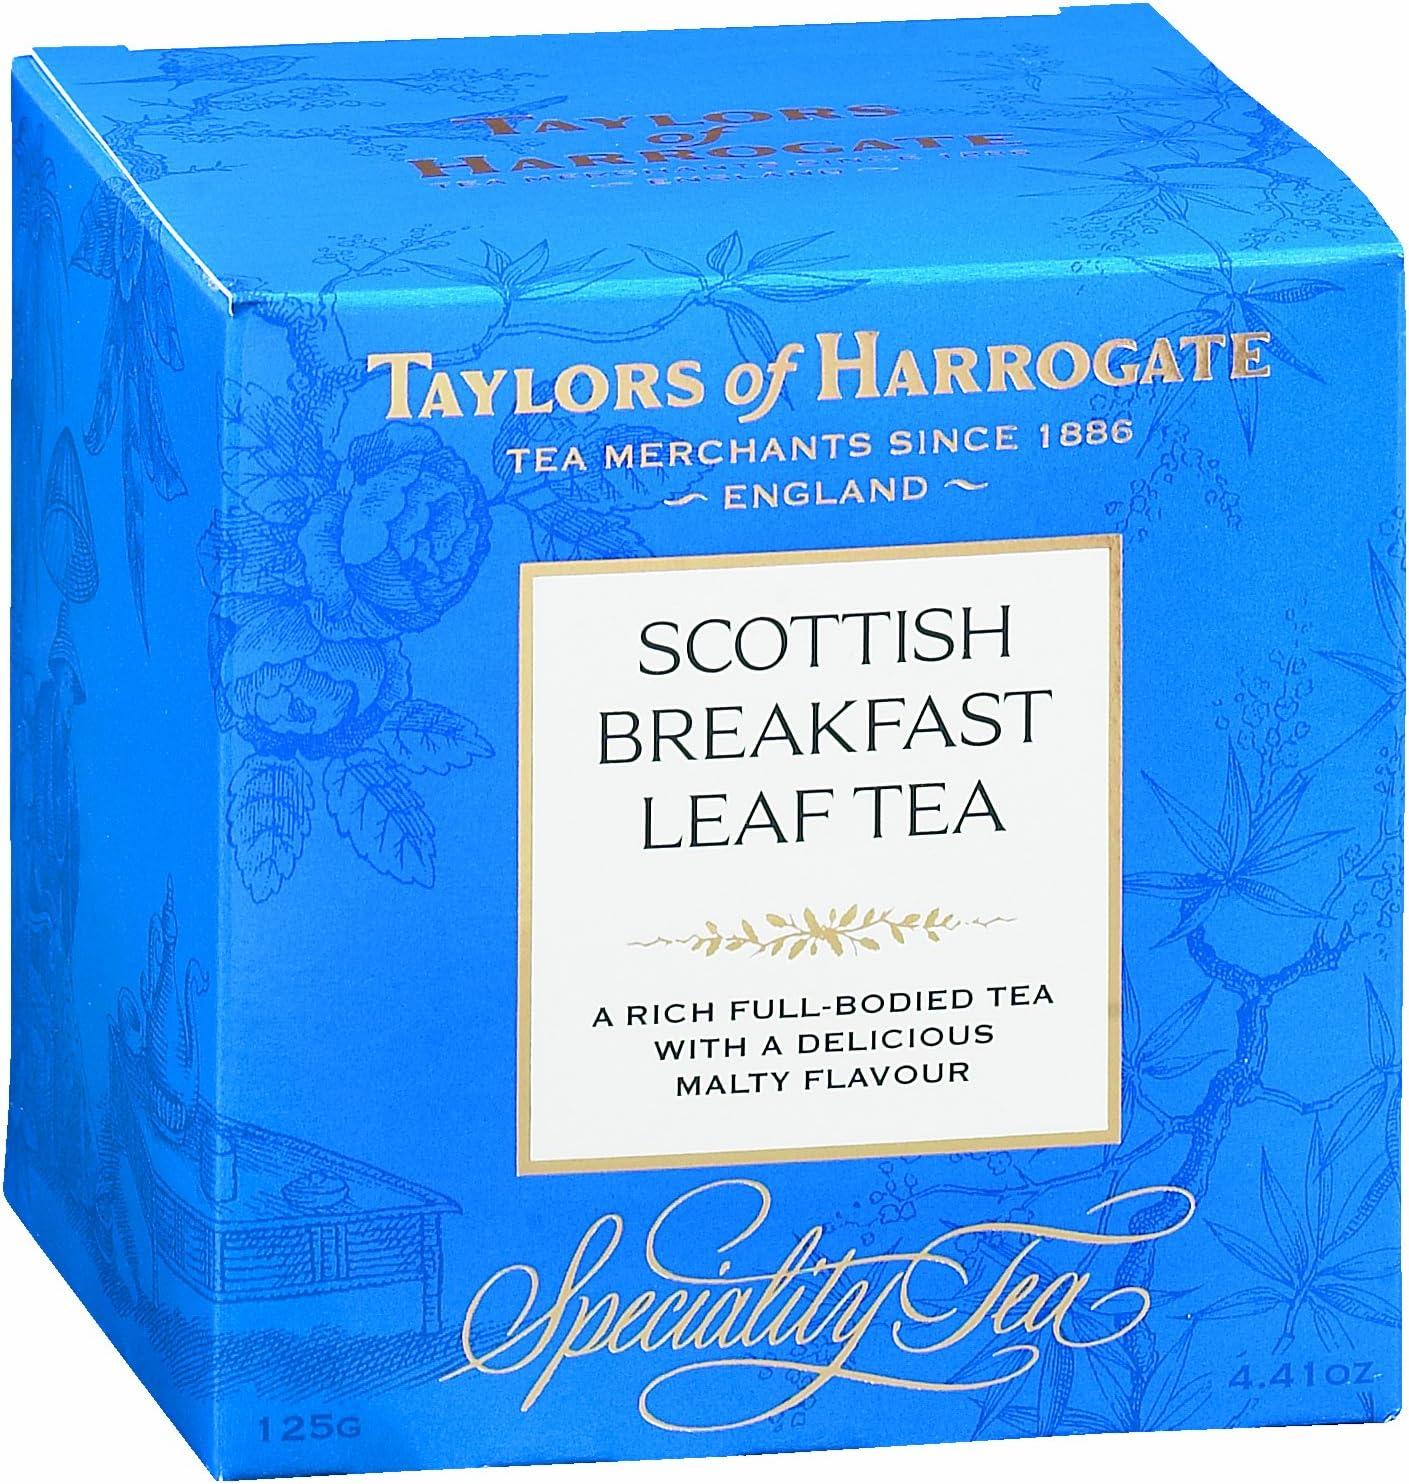 Taylors of Harrogate Scottish Breakfast Loose Leaf, 4.41 Ounce Carton